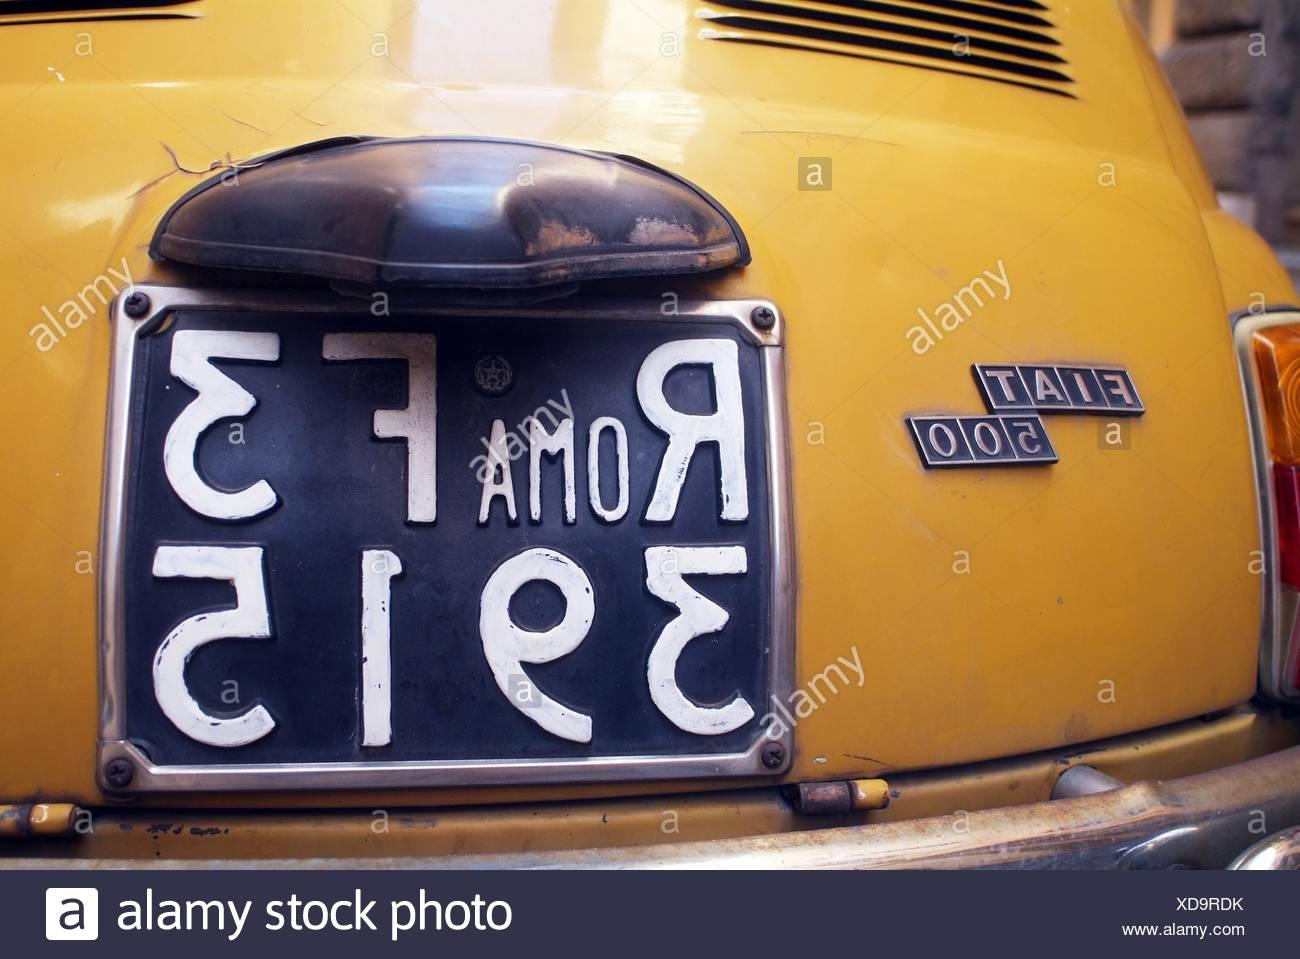 Car Registration Stock Photos & Car Registration Stock Images - Alamy